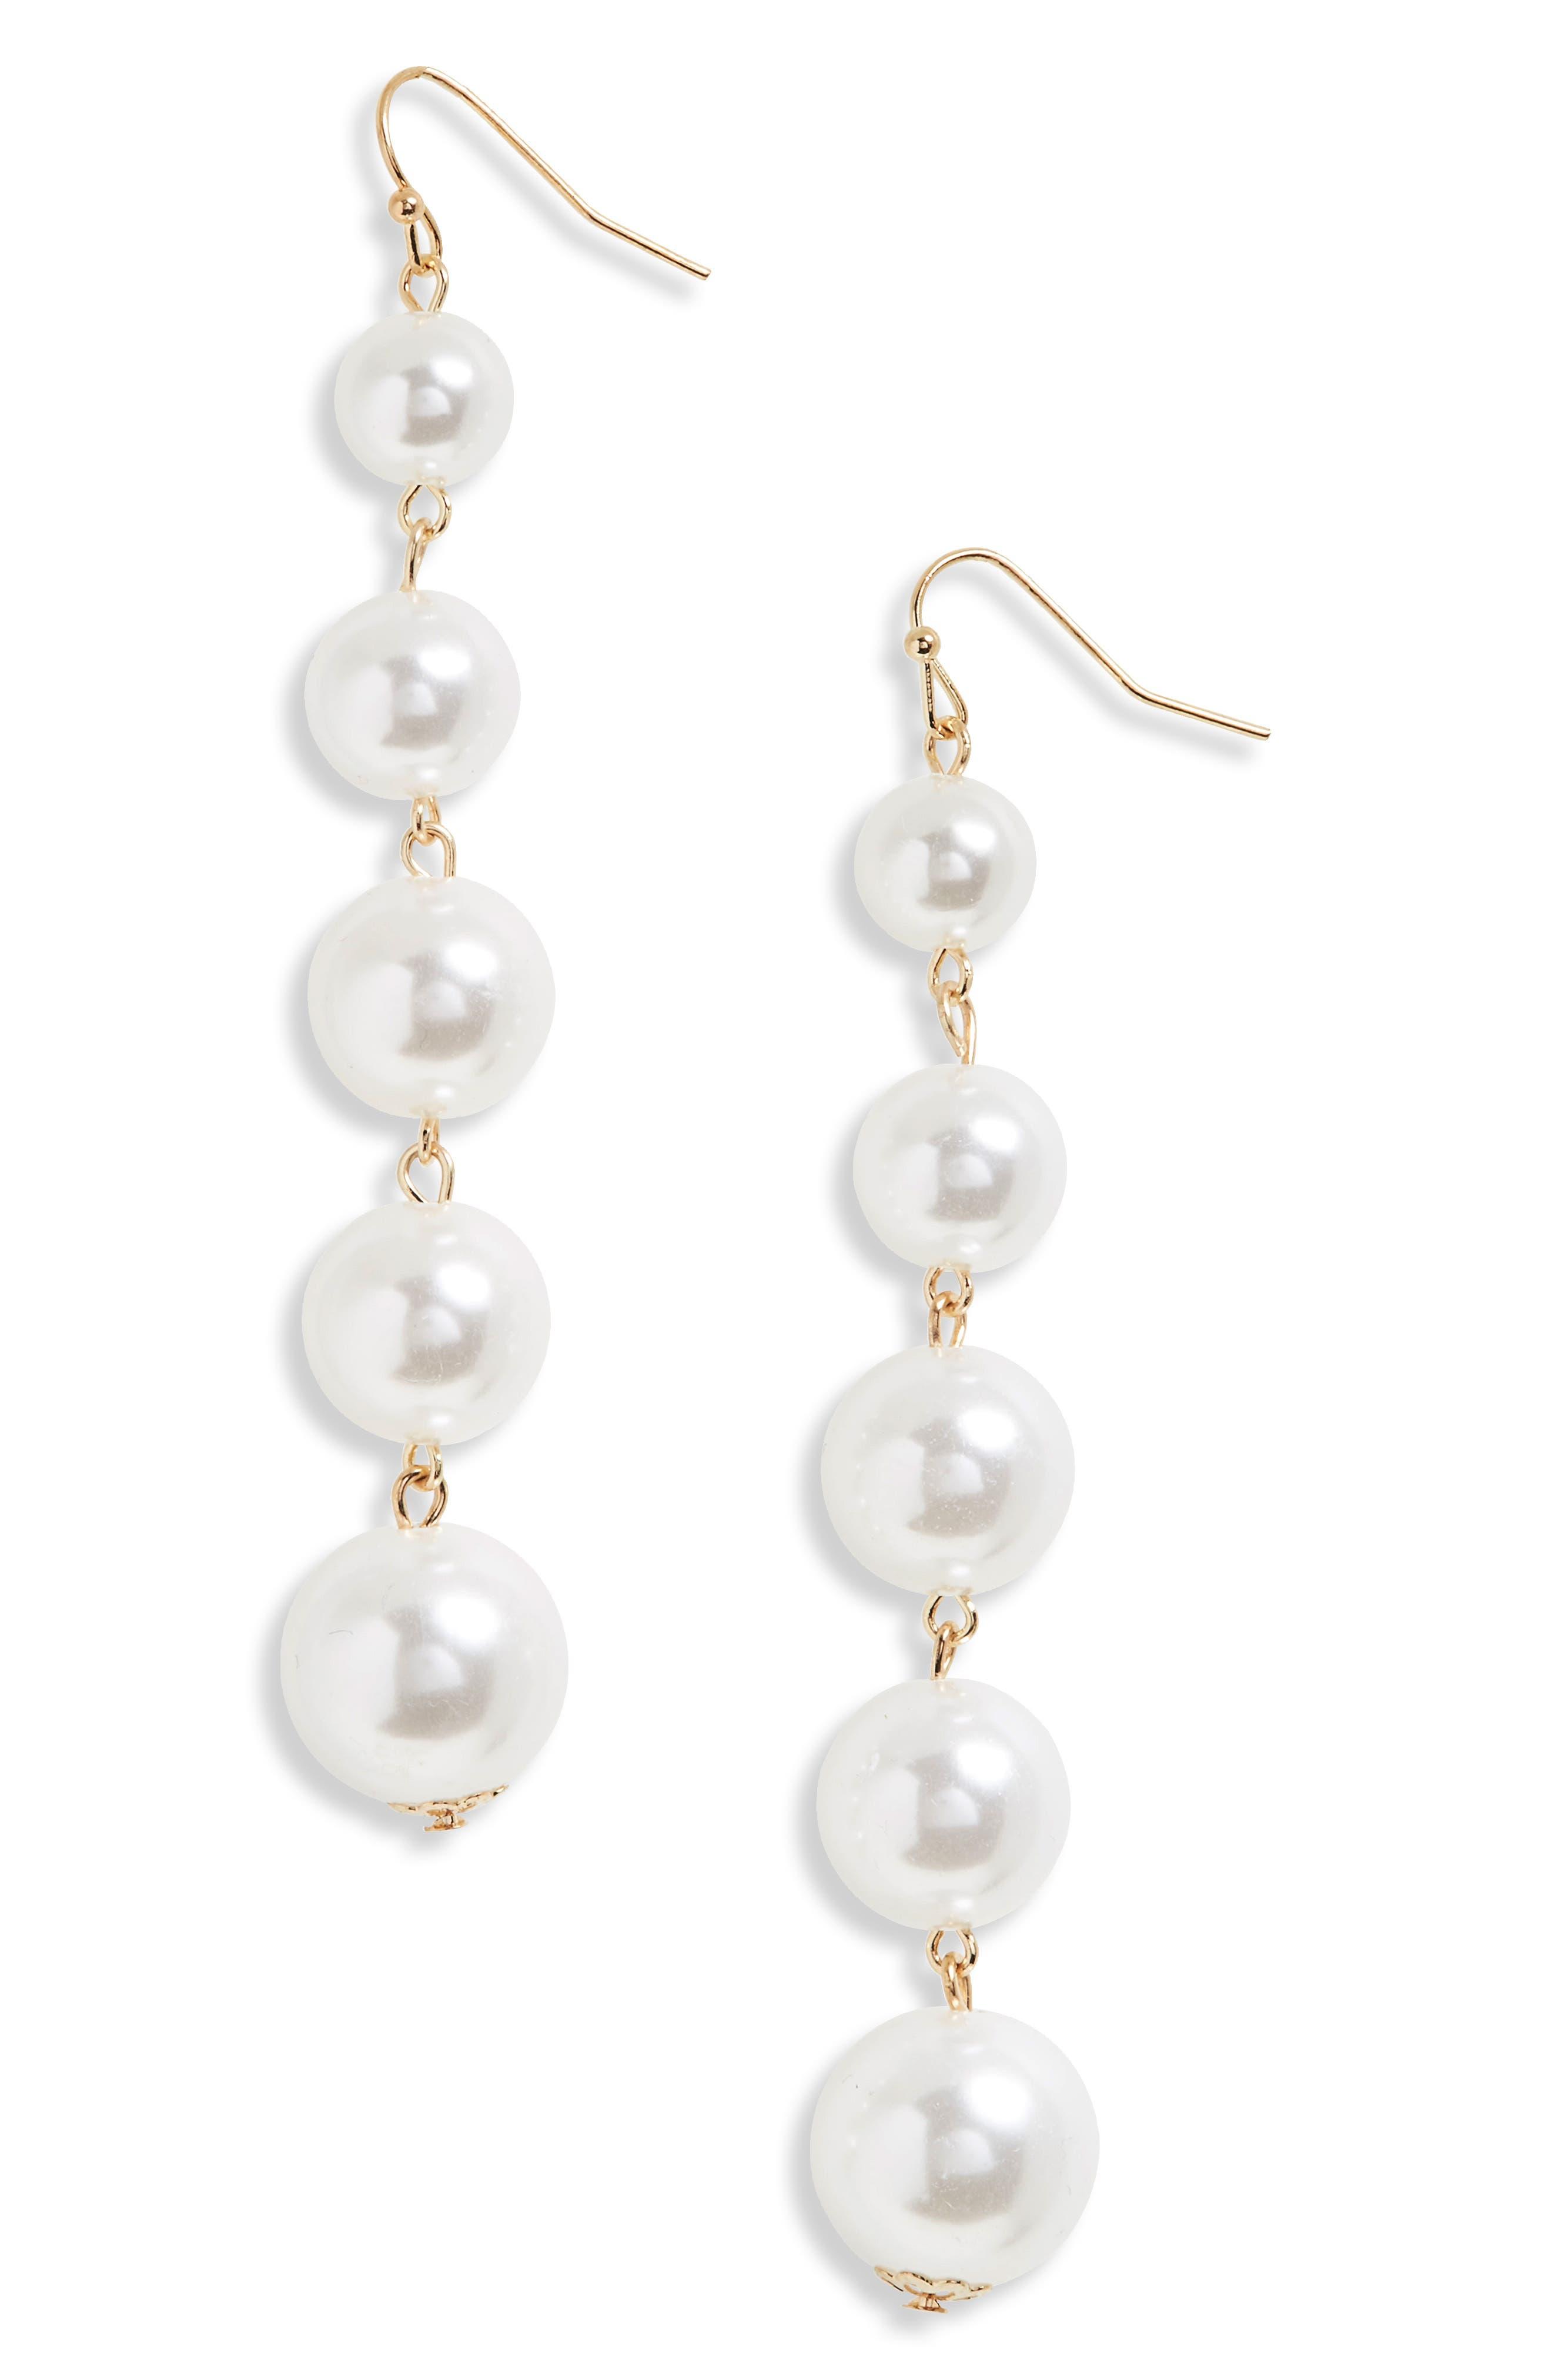 Faux Pearl Drop Earrings,                             Main thumbnail 1, color,                             040